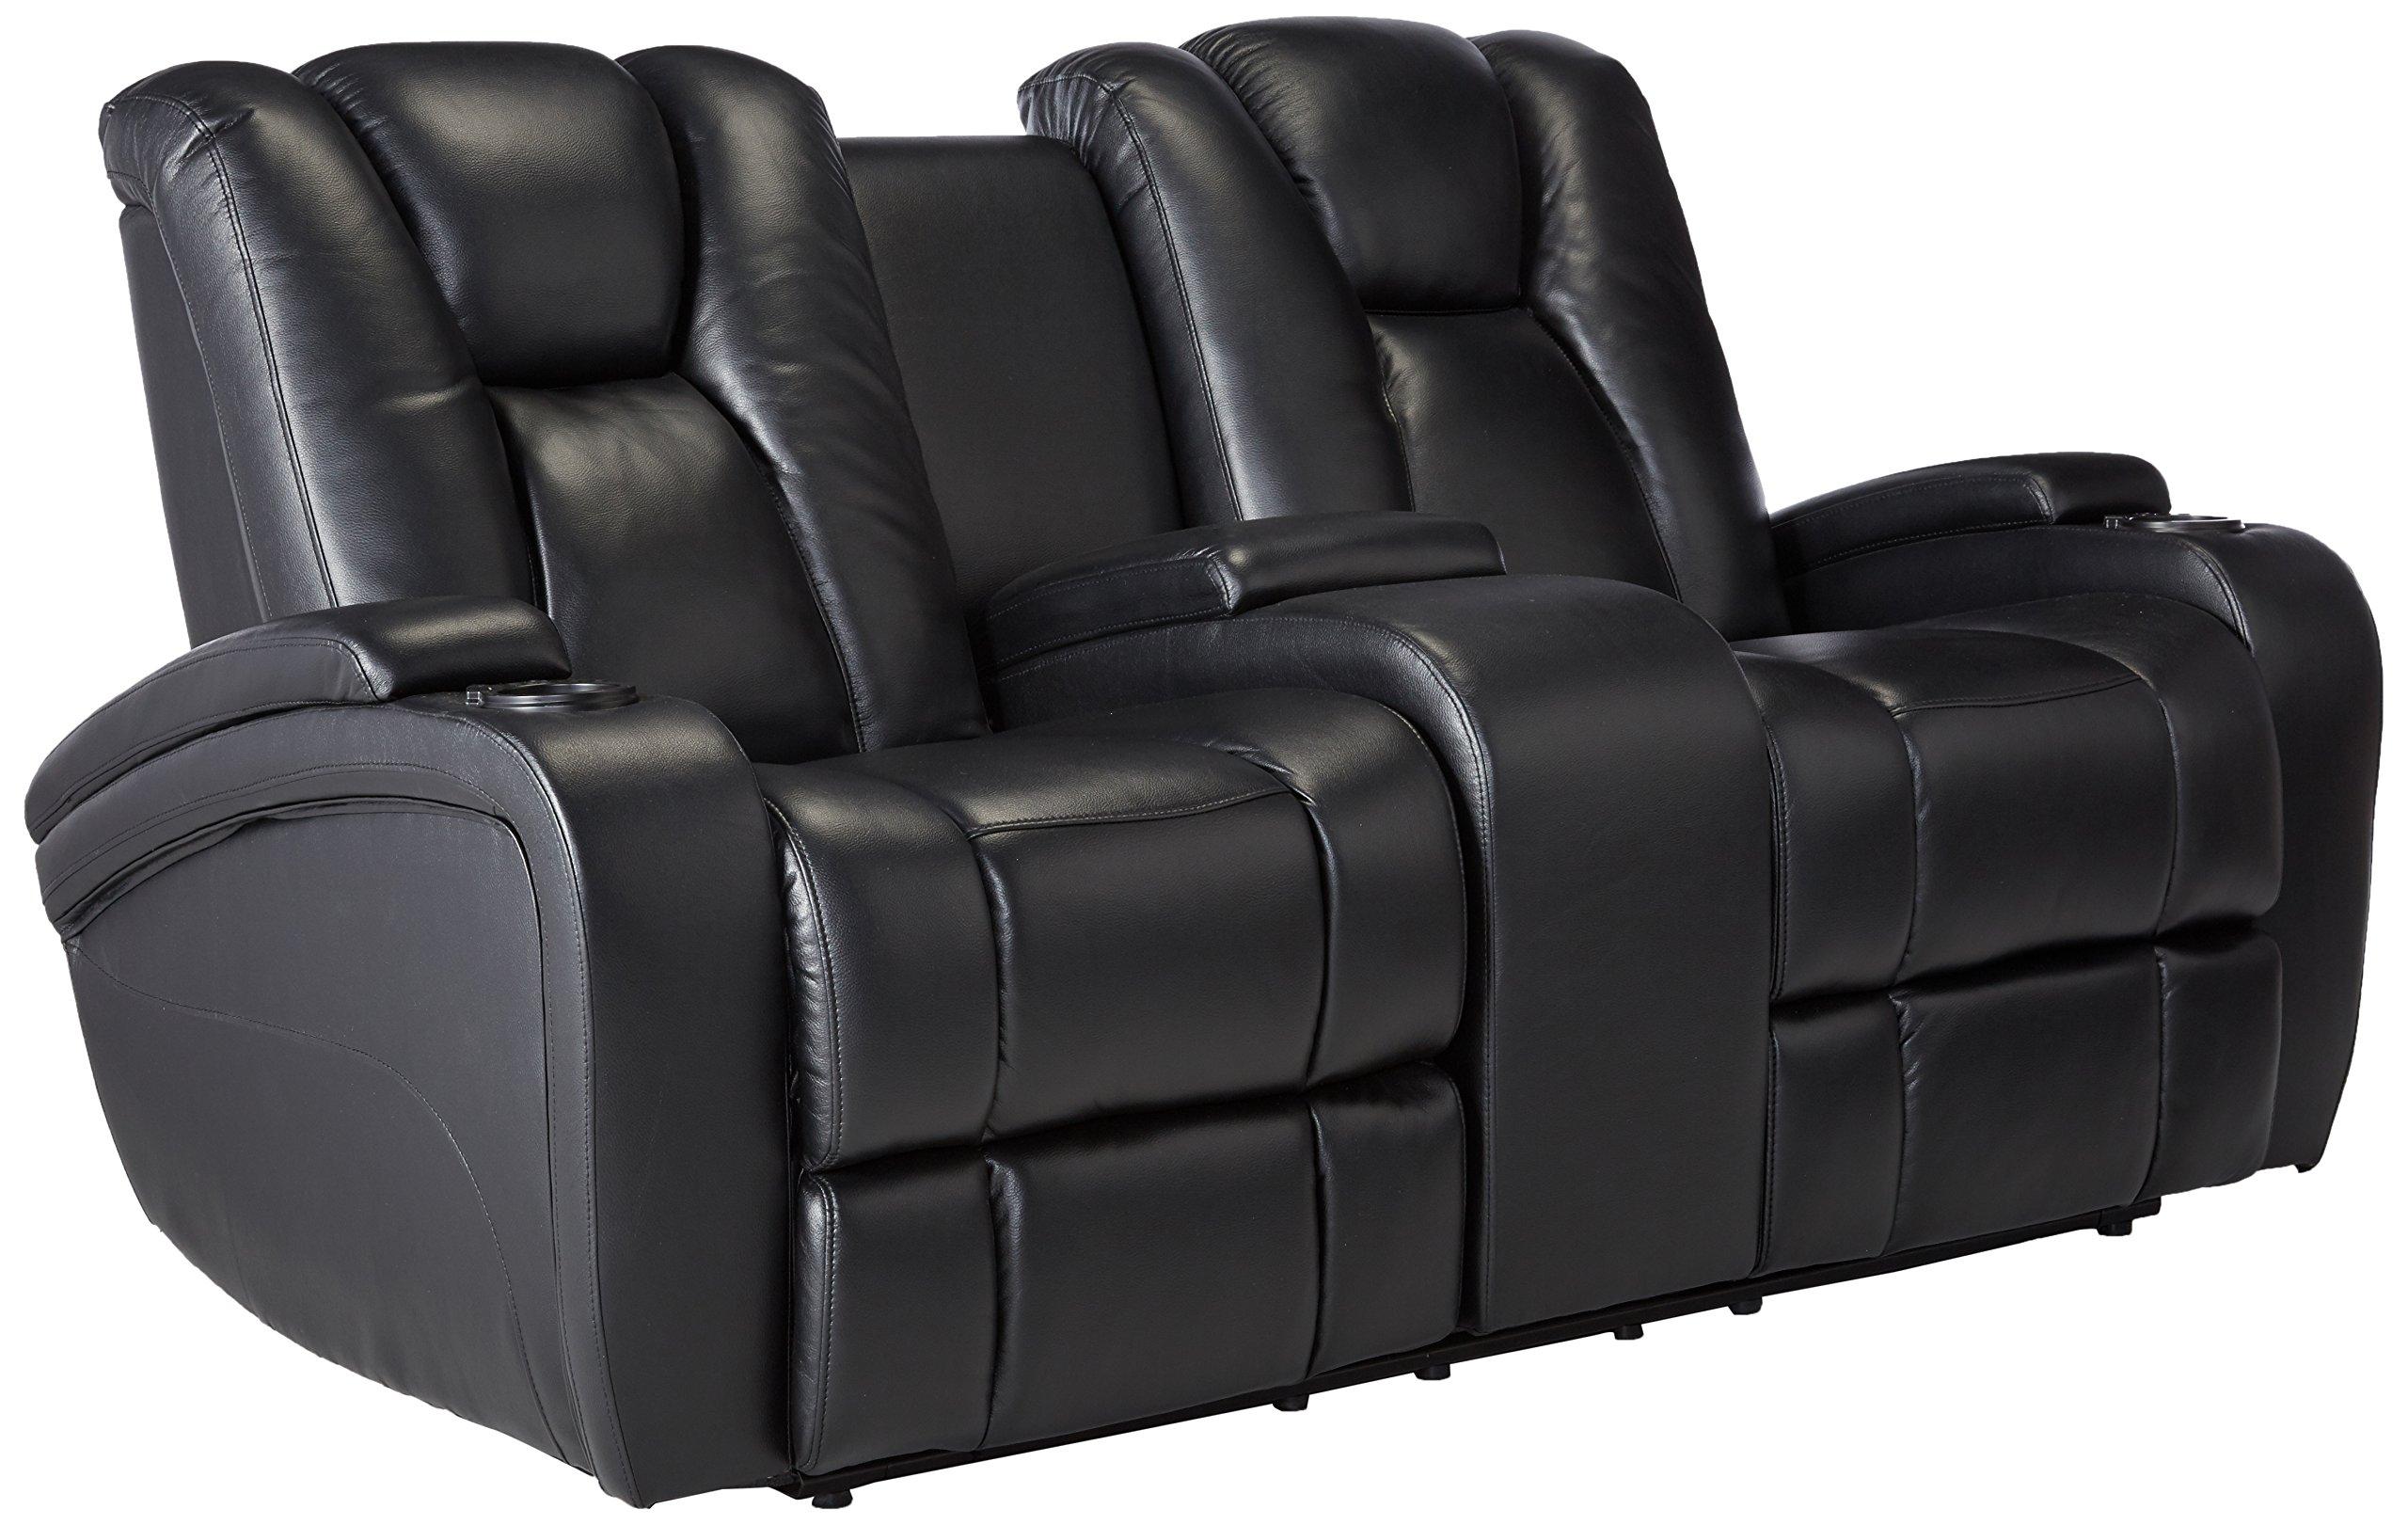 Coaster 601742P Home Furnishings Power Love Seat, Black